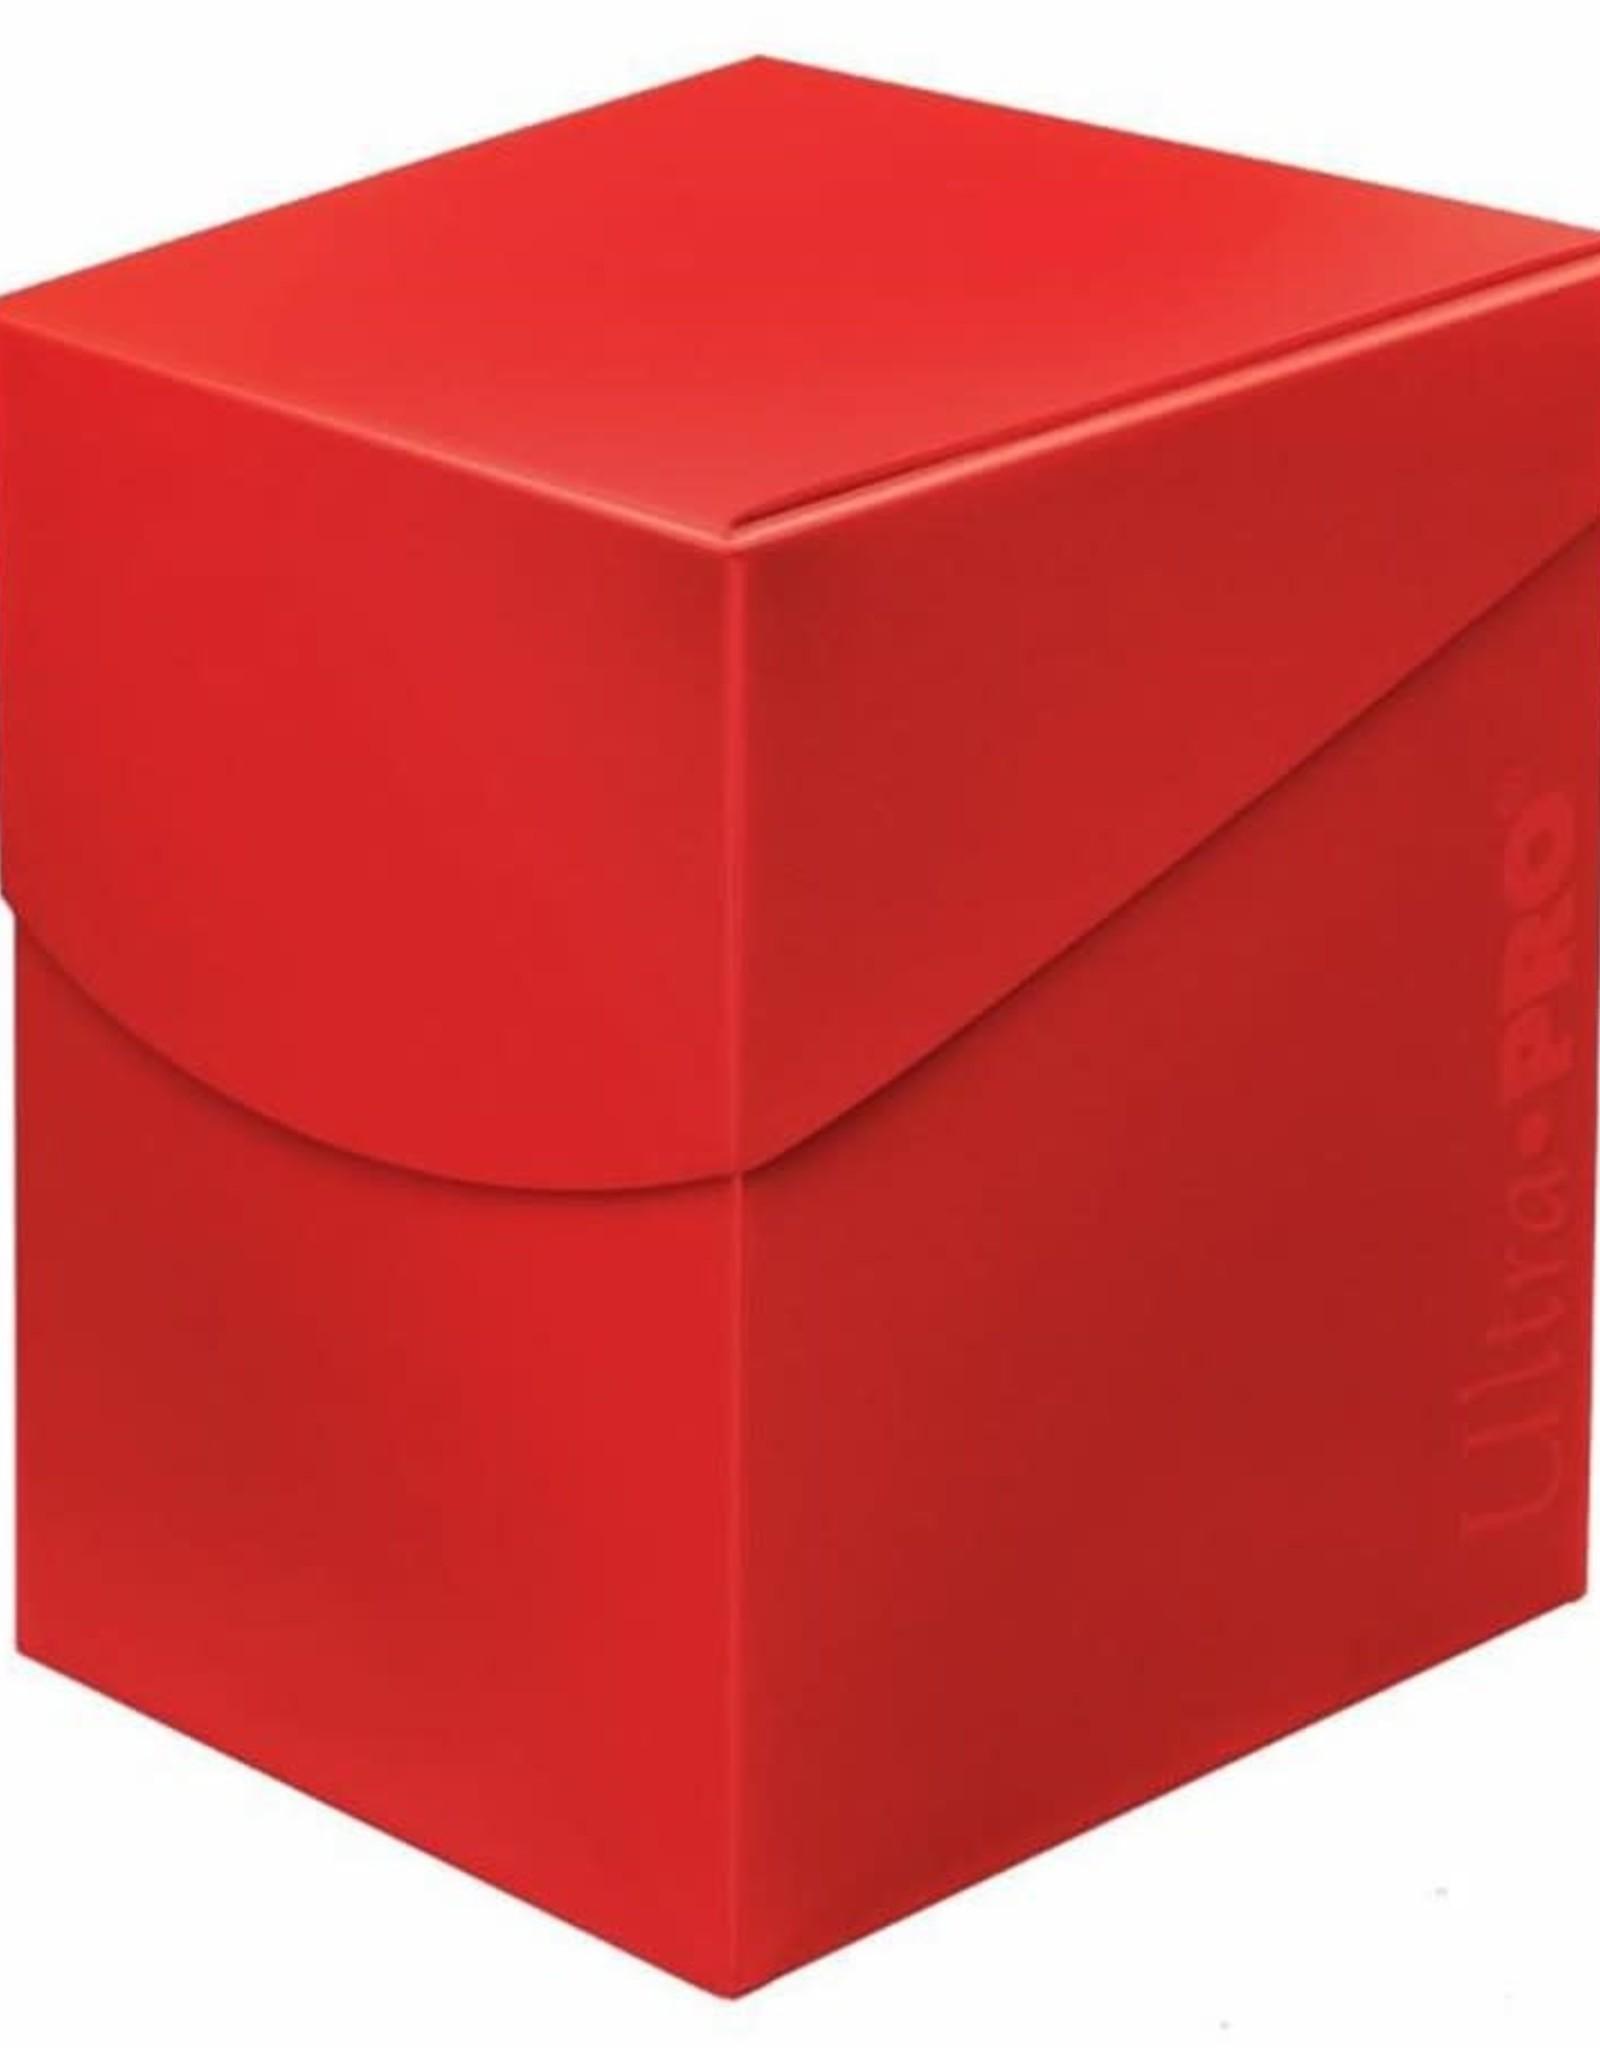 Deck Box: Eclipse 100+ Red